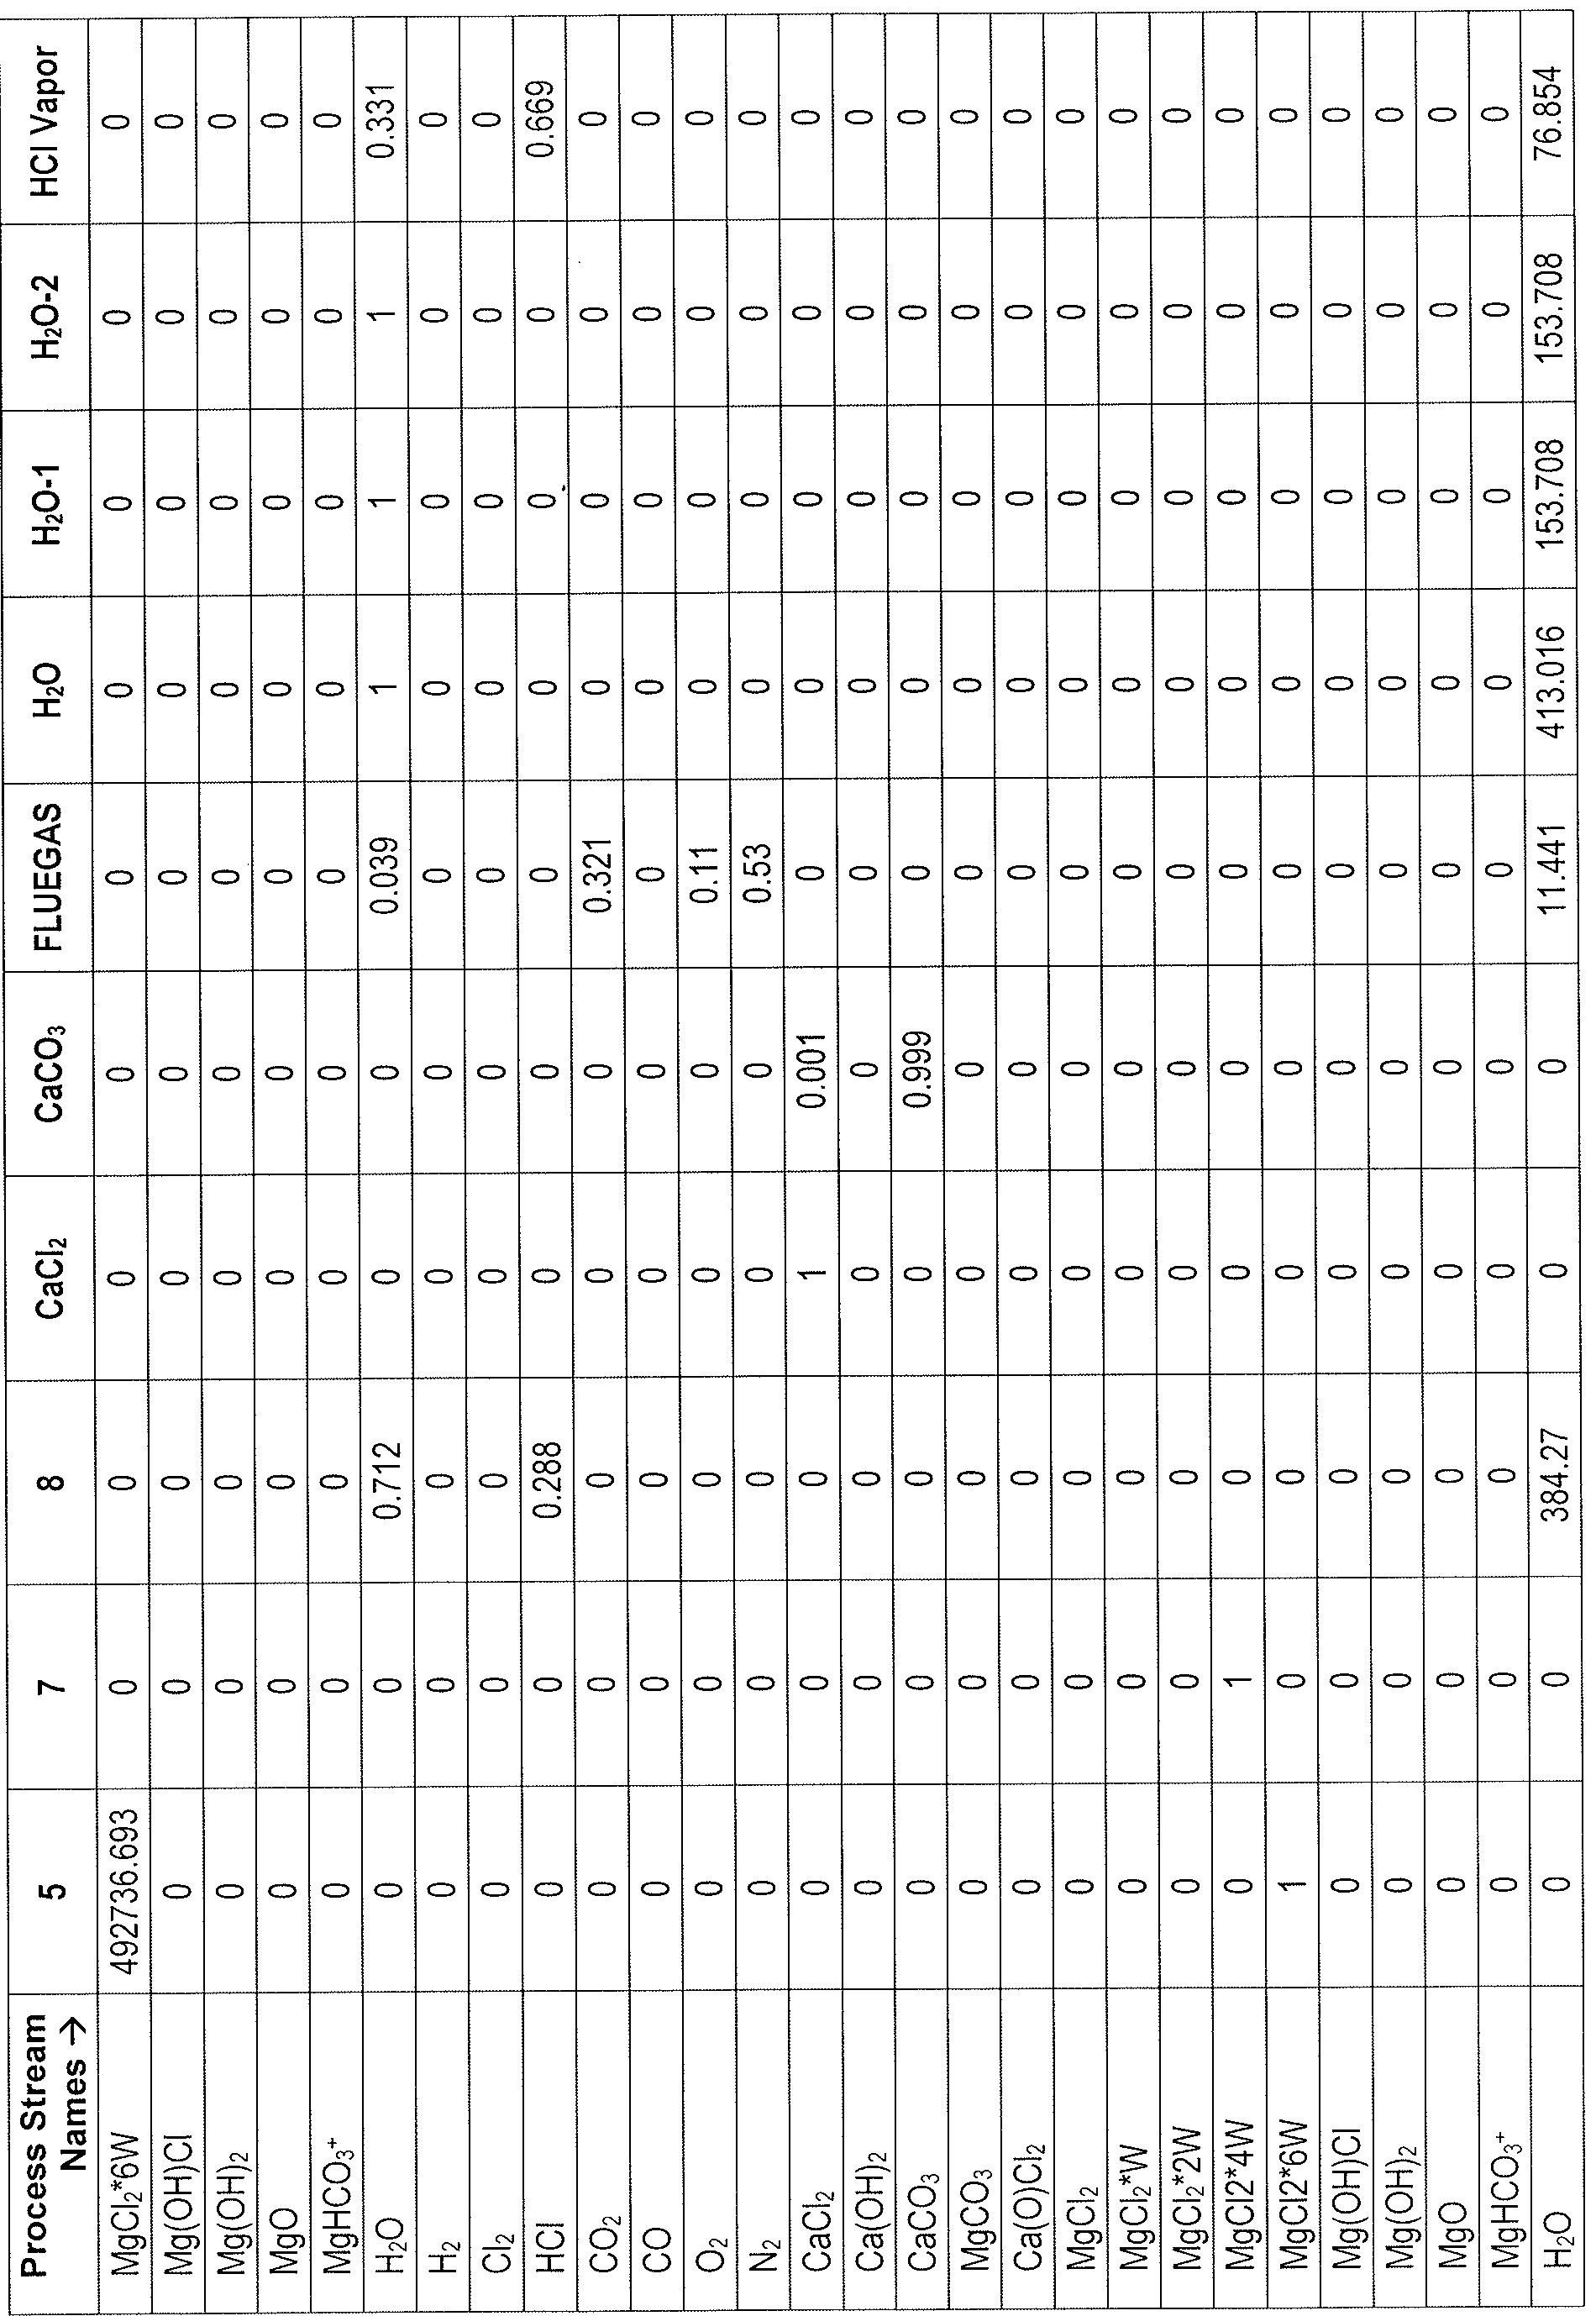 patent wo2012122496a1